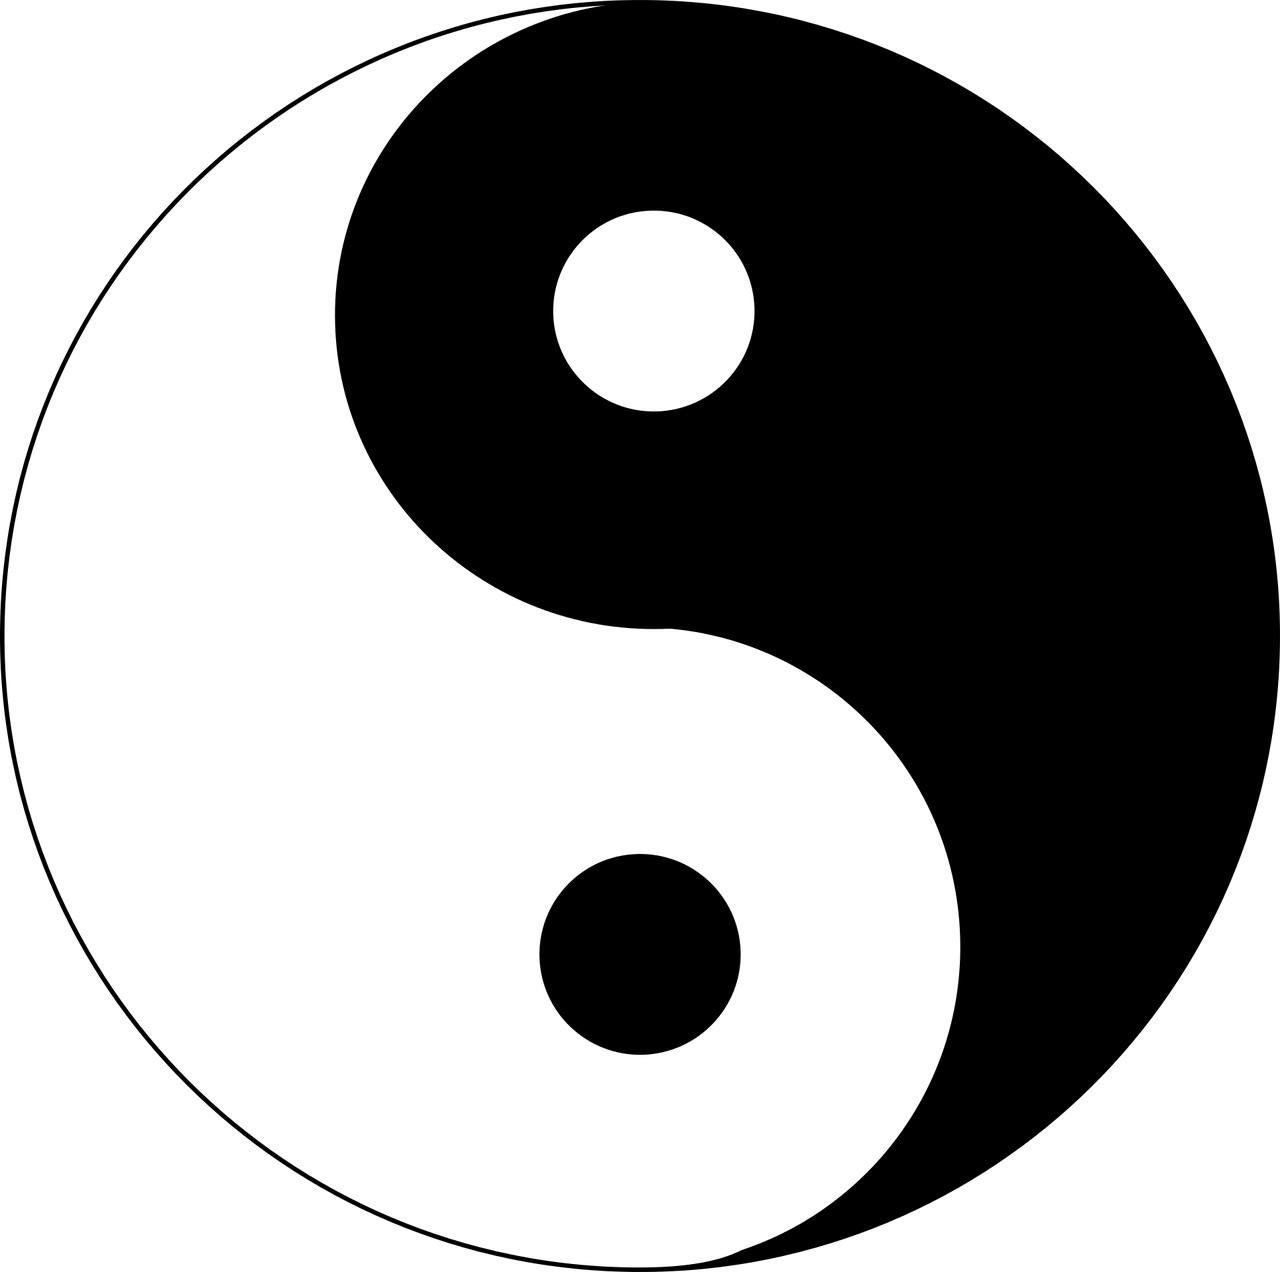 'Body in Balance' Tai Chi Gong workshop happening Feb. 21